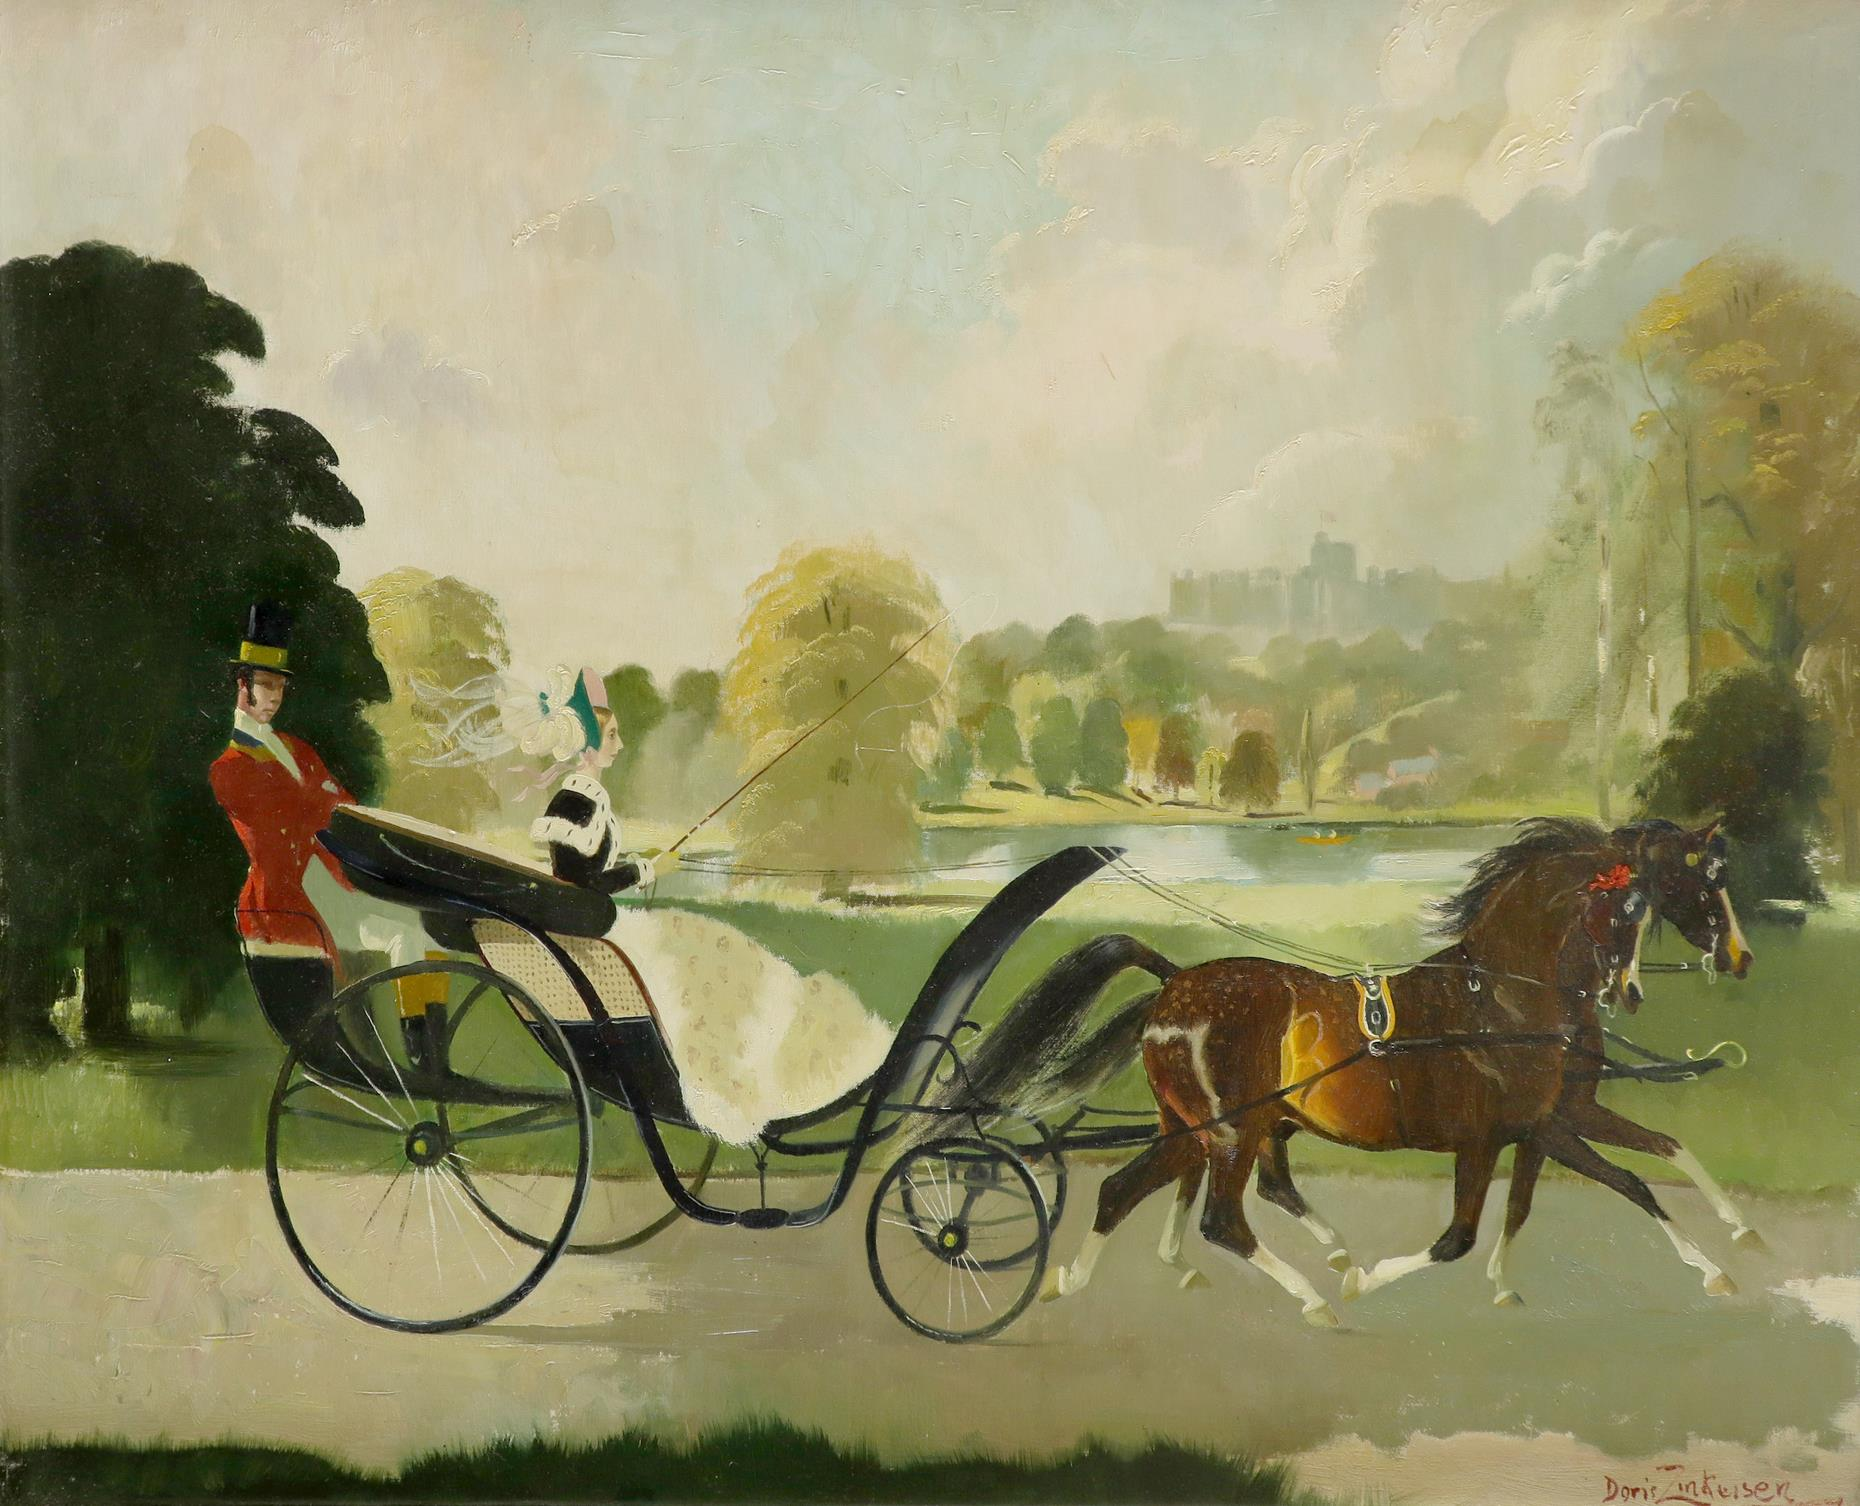 ‡Doris Zinkeisen (Scottish 1898-1991) Riding near Windsor Signed Doris Zinkeisen (lower right) Oil